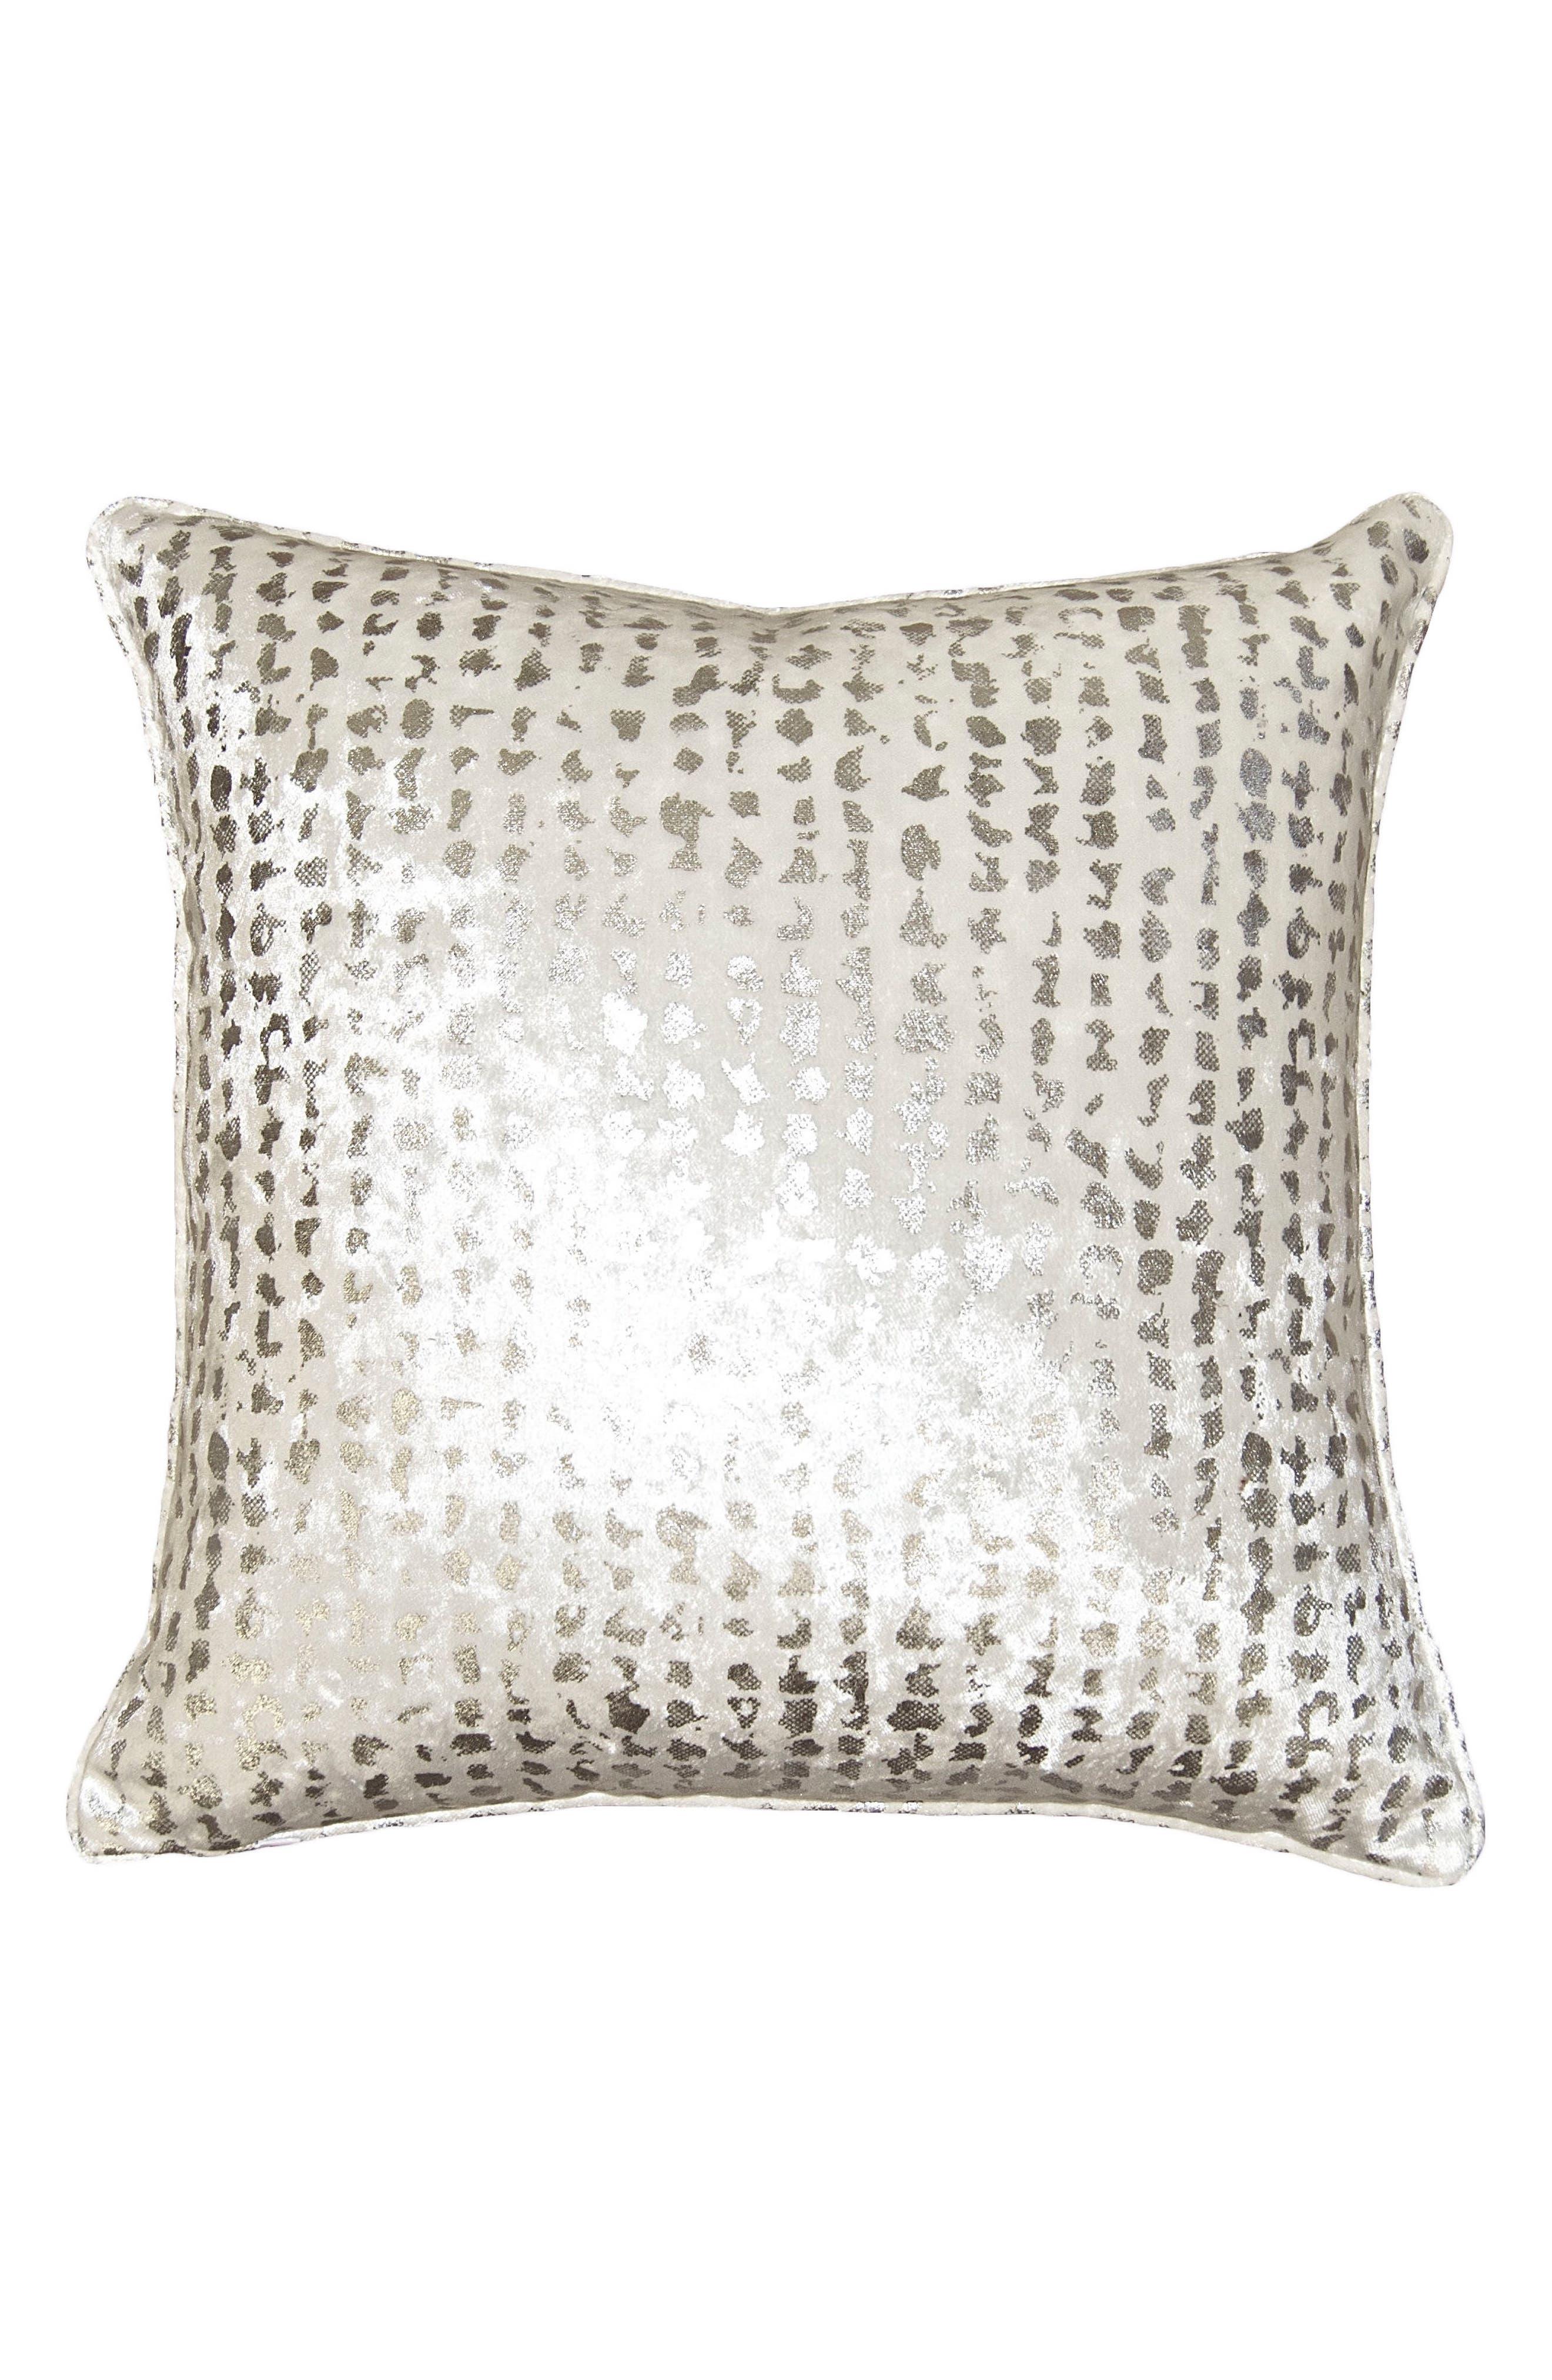 Silver Dots Accent Pillow,                         Main,                         color, 040